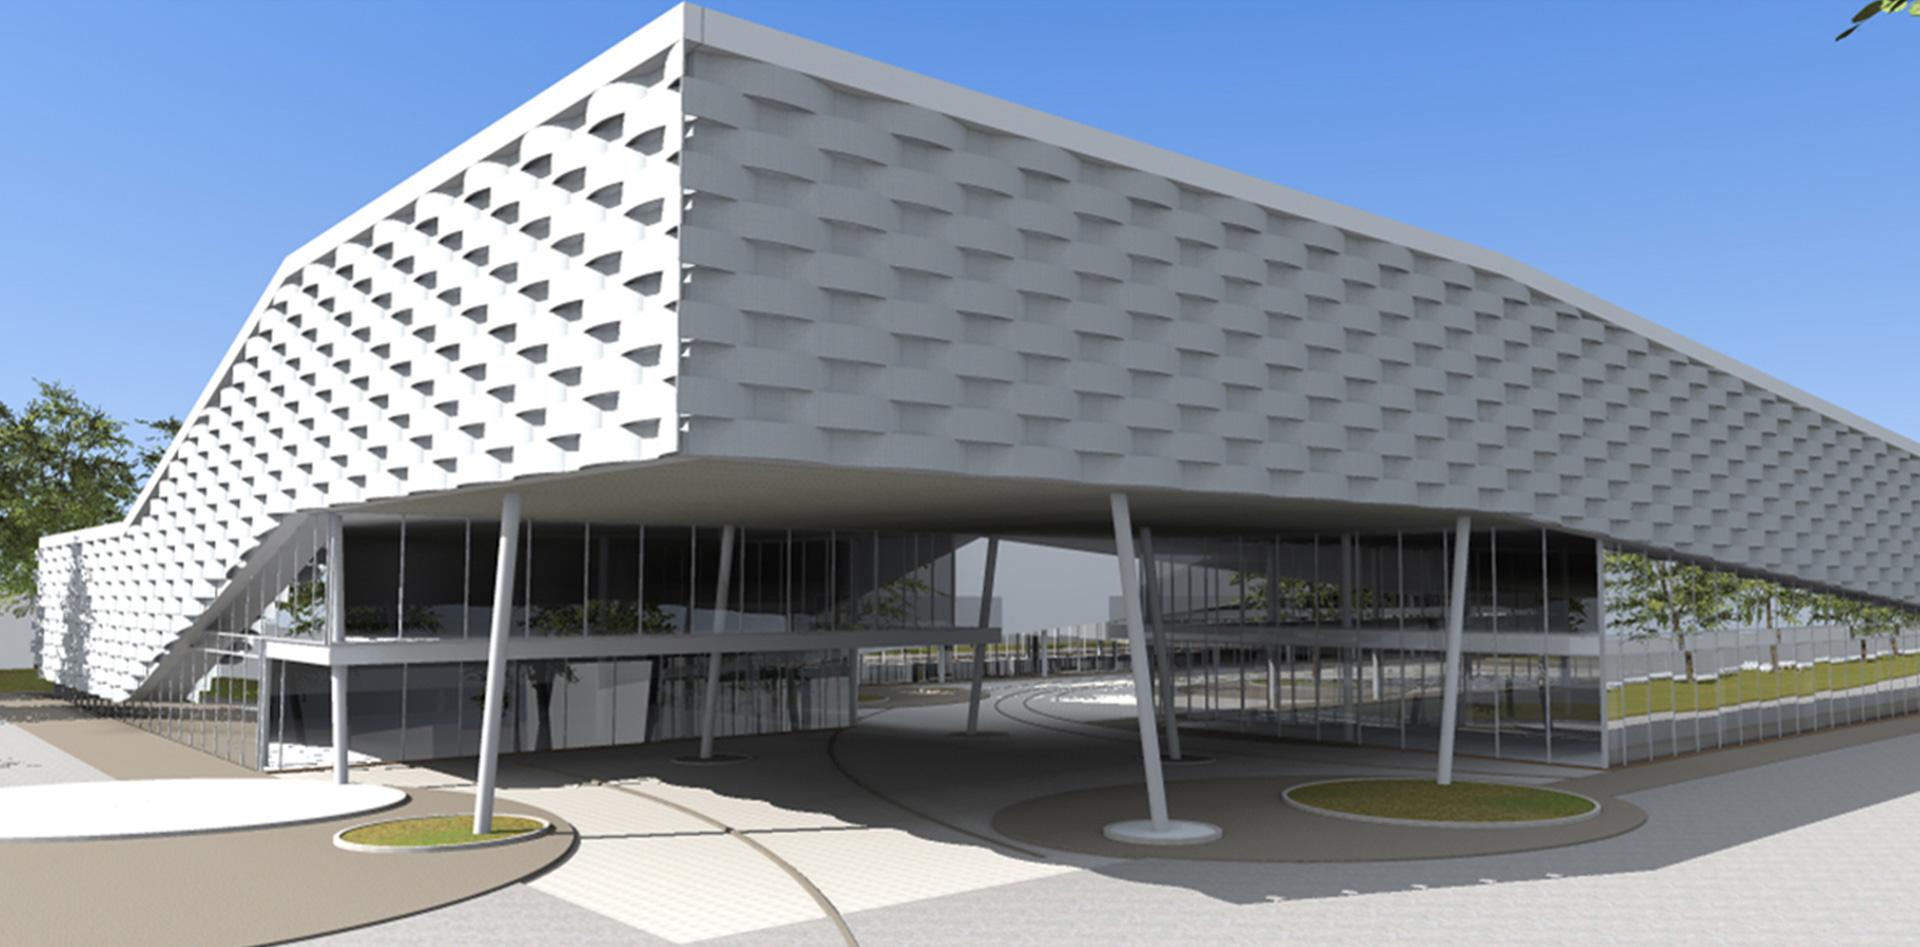 Reggiana Riduttori, Binini Partners, Società di architettura e ingegneria